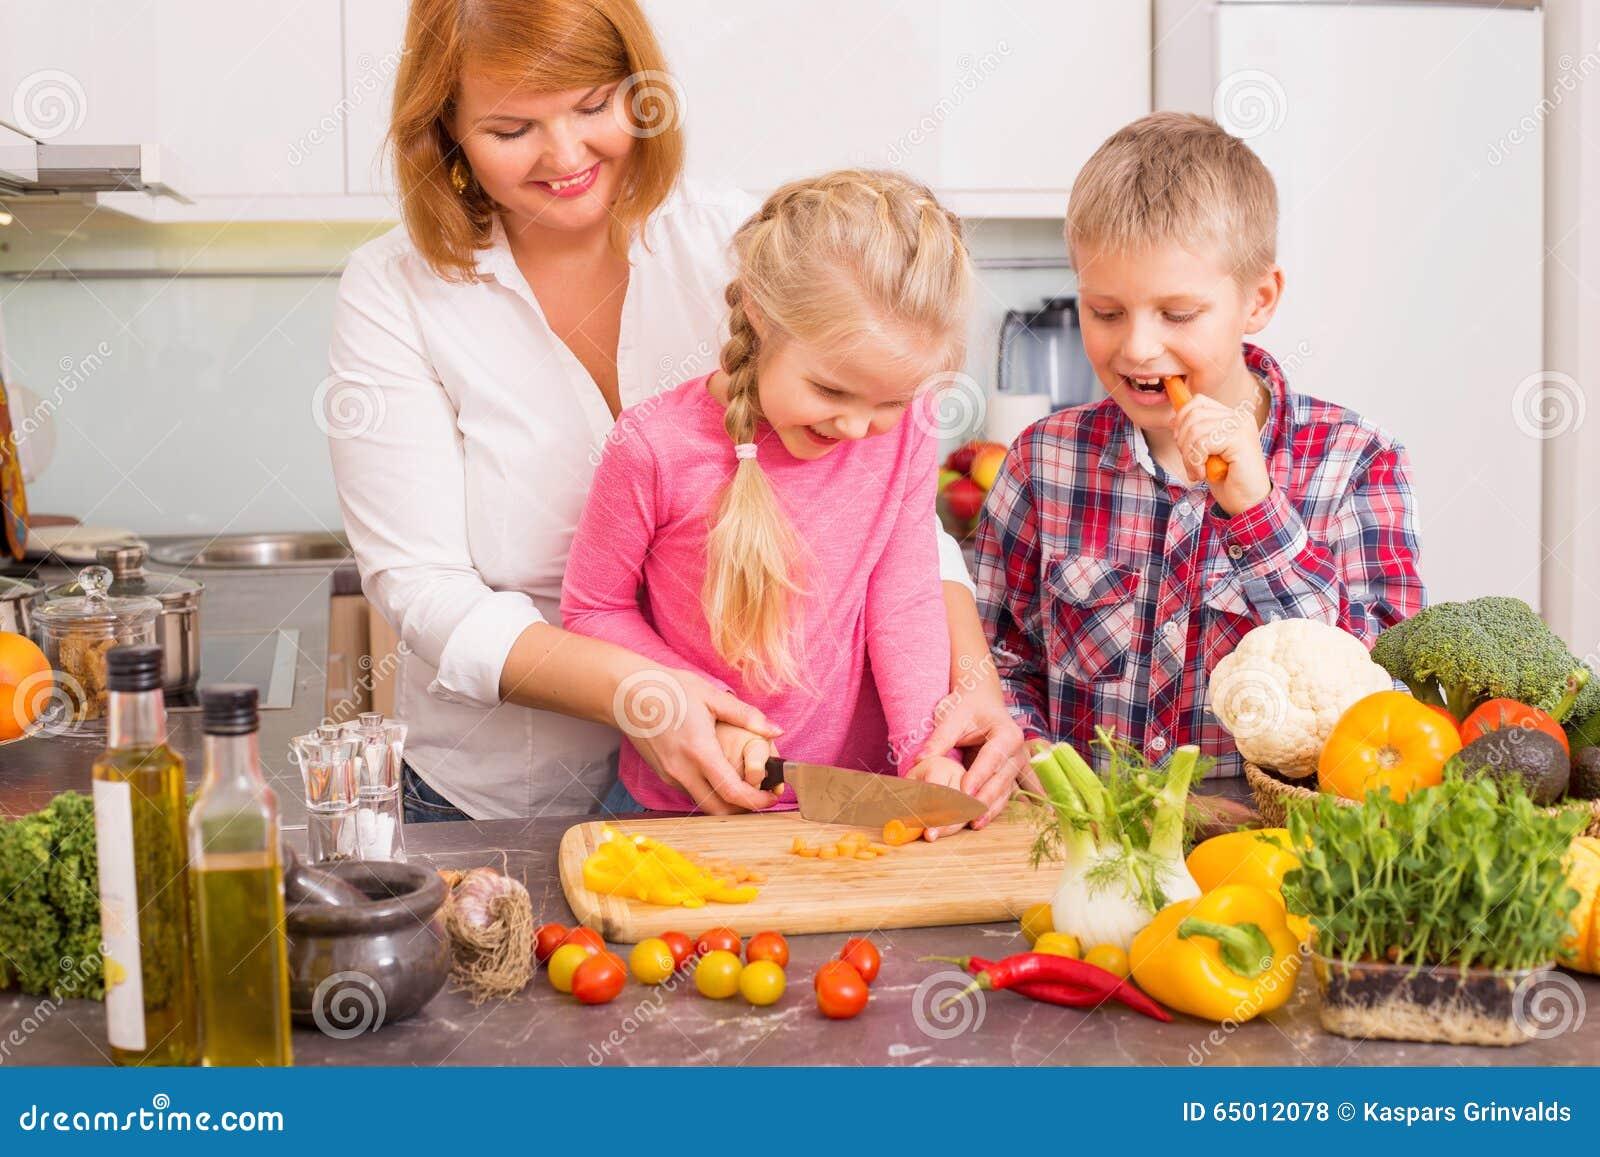 follada en cocina 28 images 161 necesito plata aprende